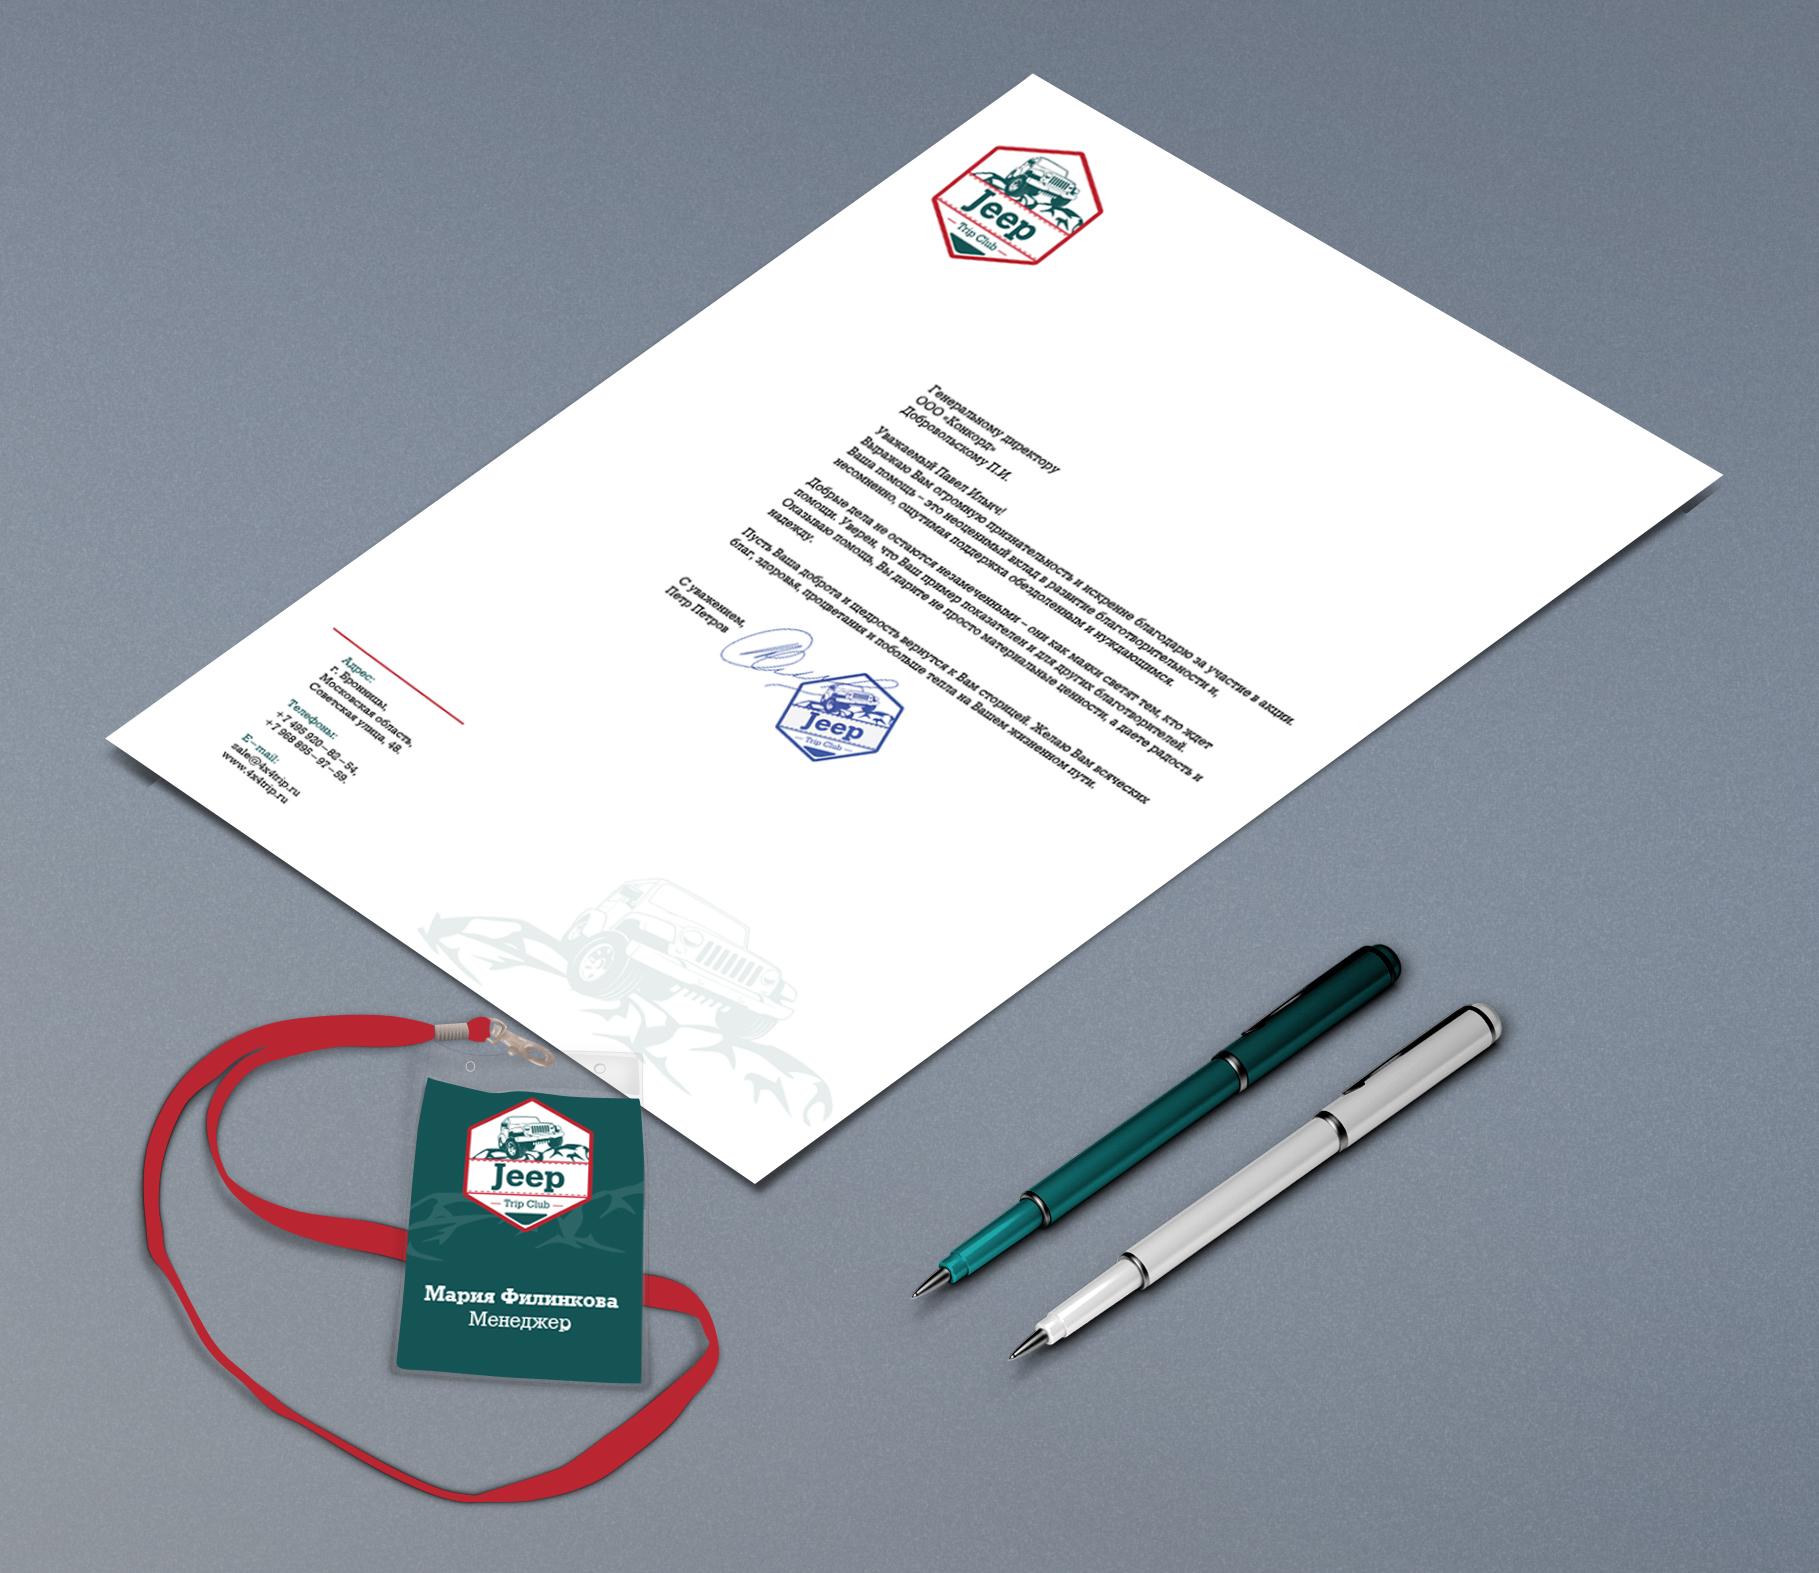 Создать или переработать логотип для Jeep Trip Club фото f_570542e77d40acba.jpg